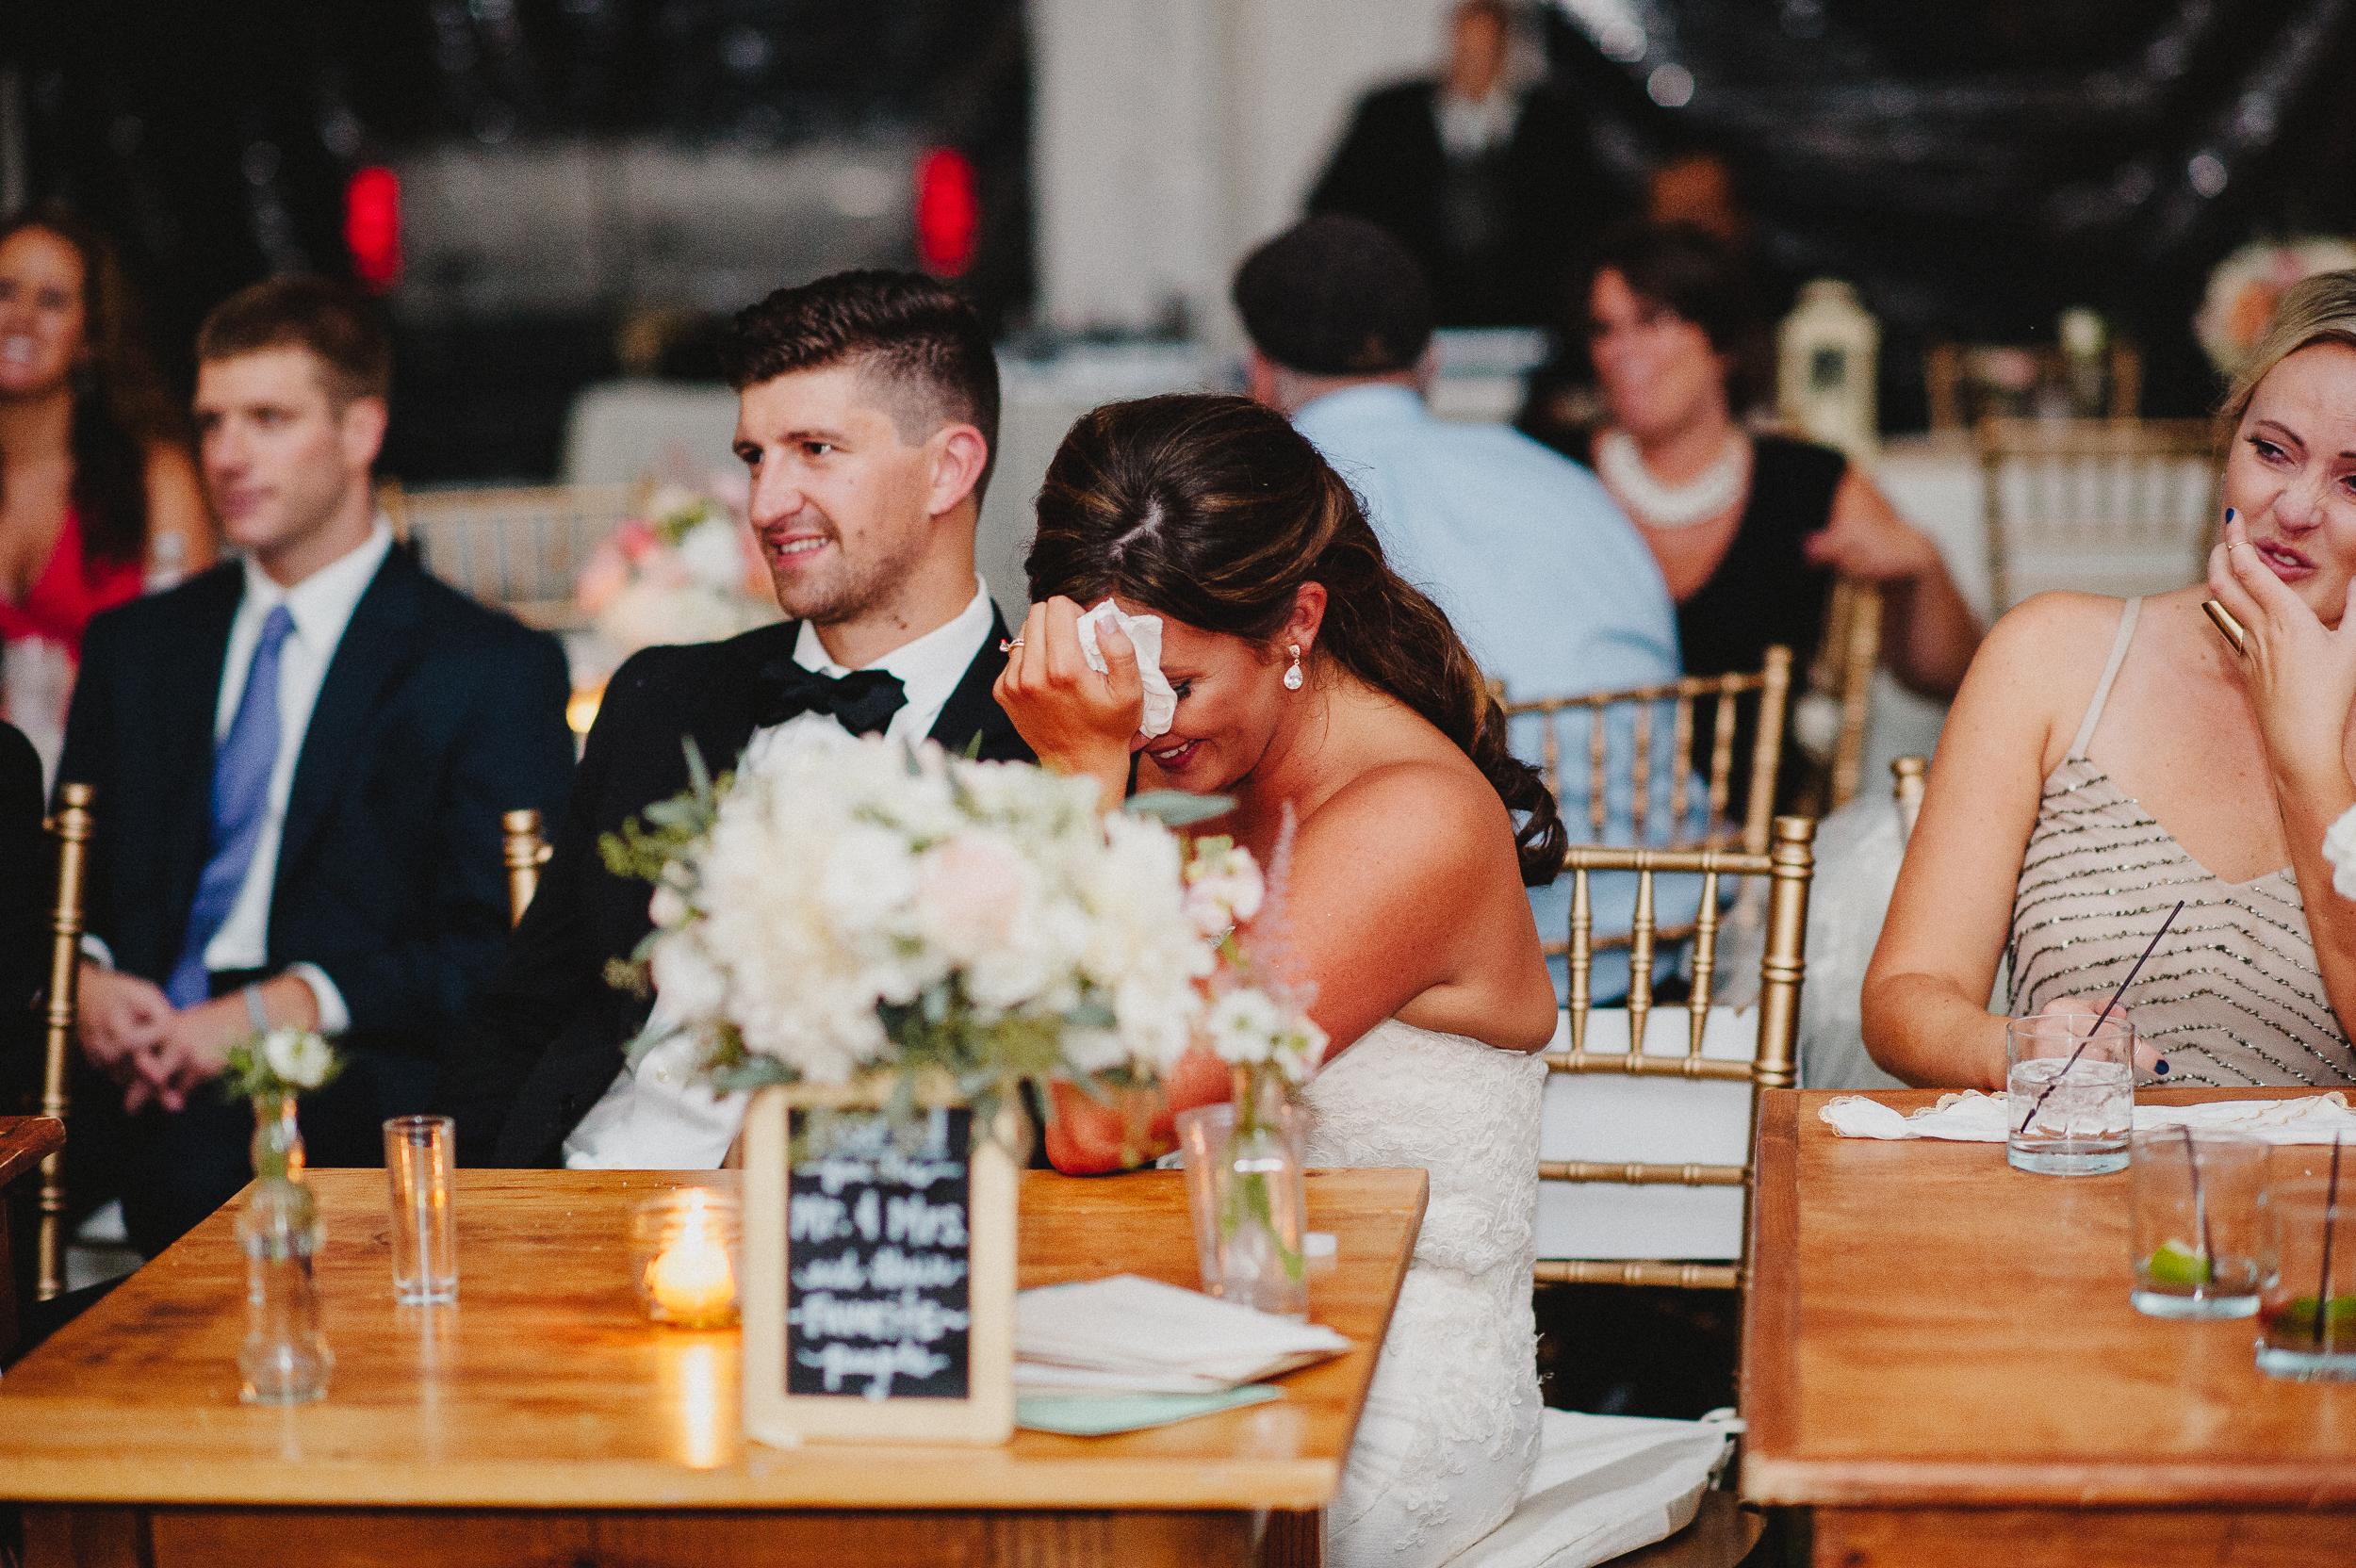 delaware-estate-wedding-photographer-pat-robinson-photography-117.jpg